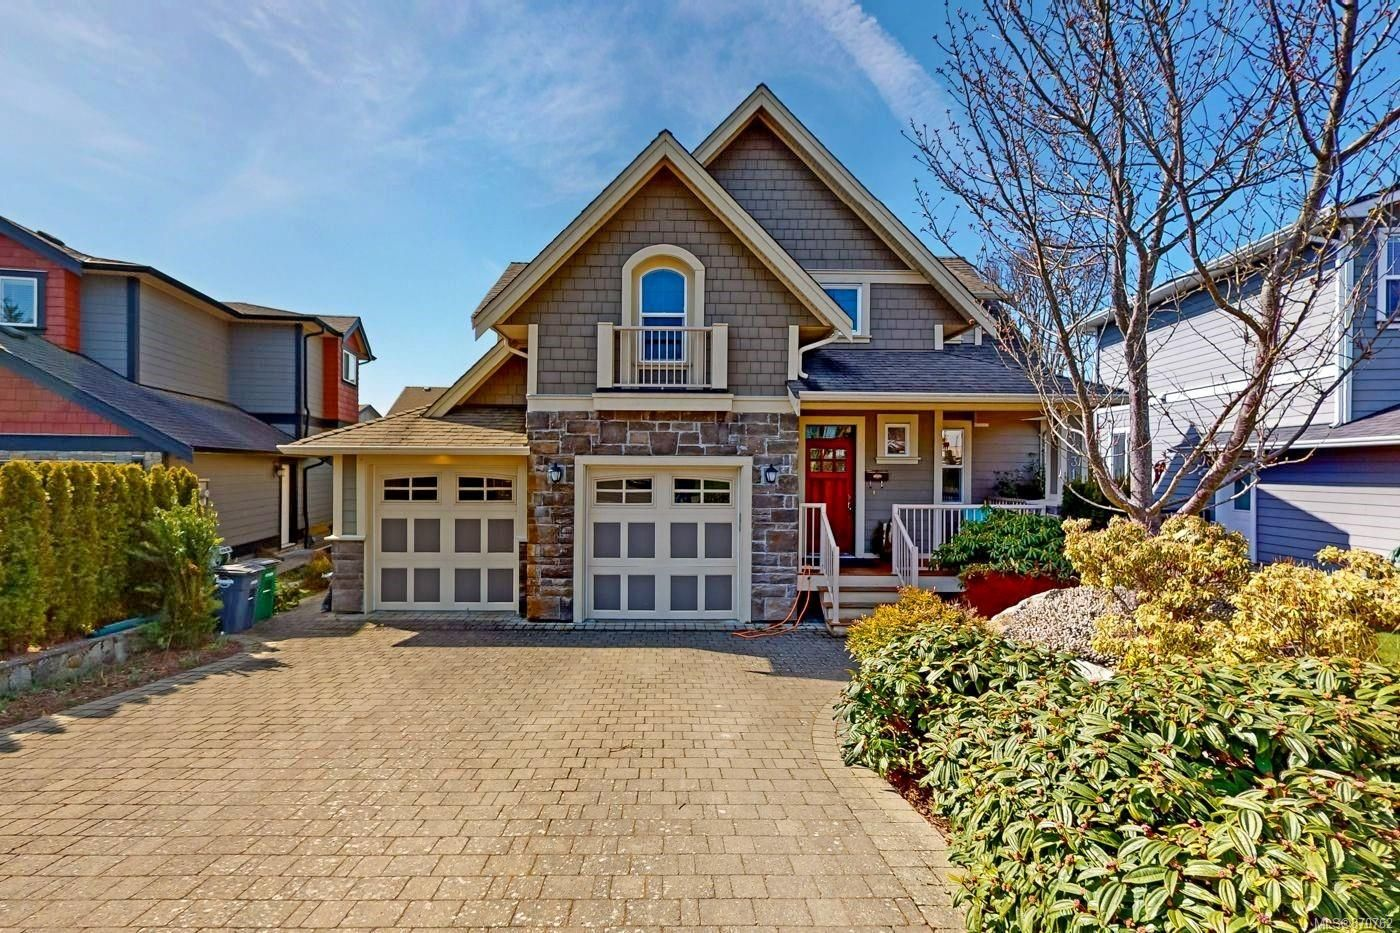 Main Photo: 1831 Fairburn Dr in : SE Gordon Head House for sale (Saanich East)  : MLS®# 870762